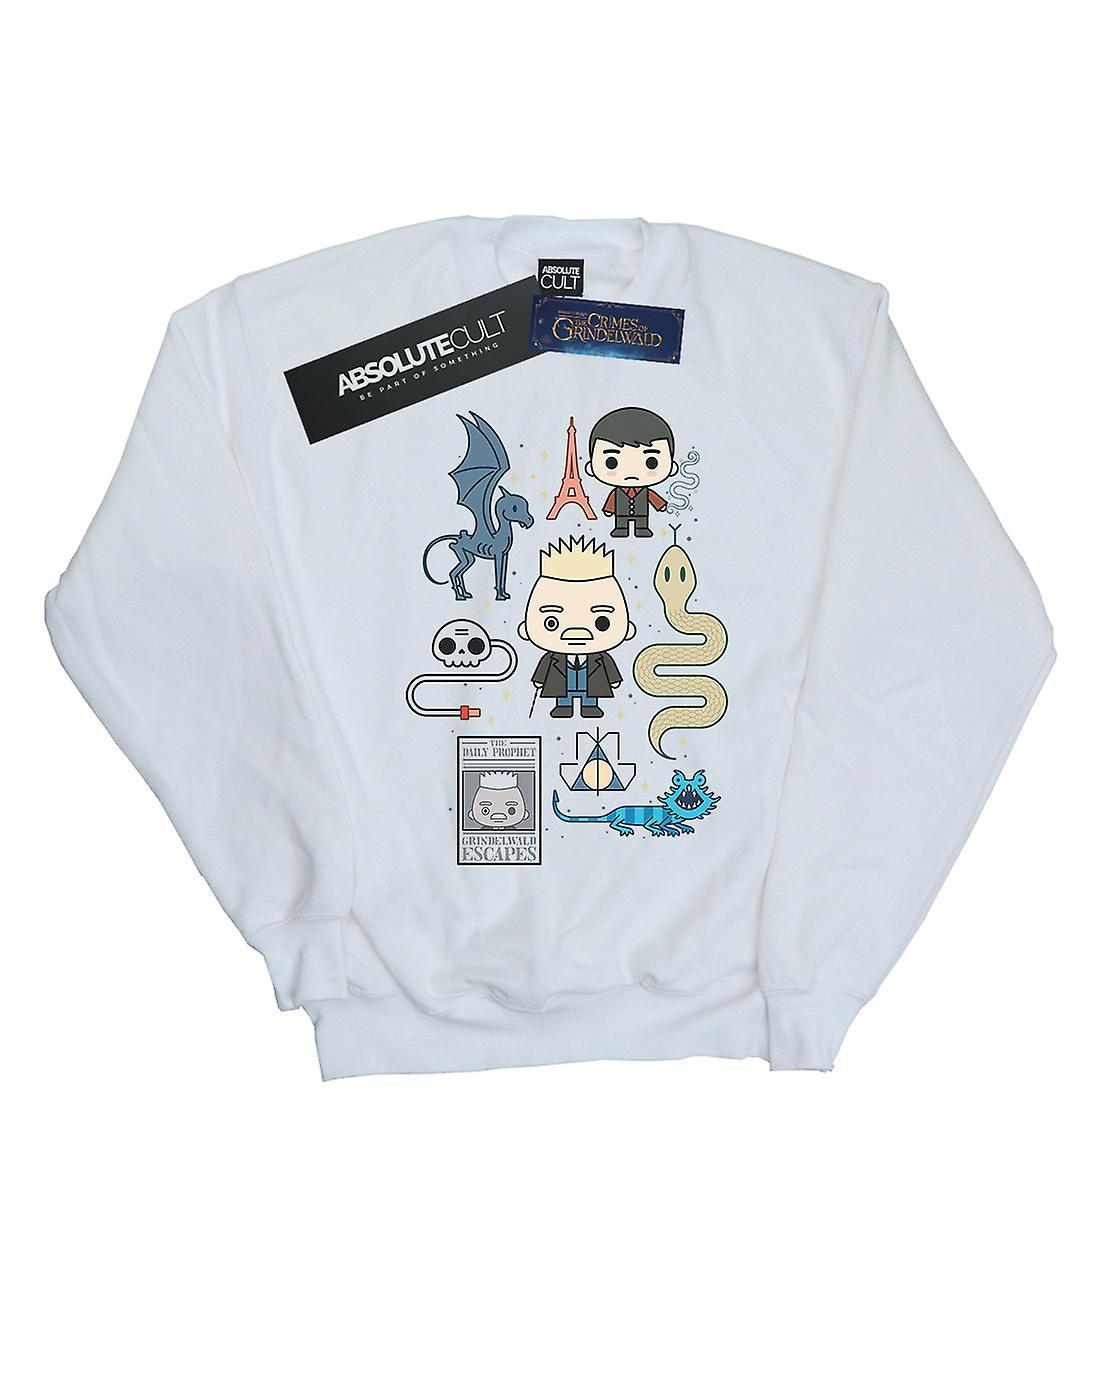 Fantastic Beasts Boys Chibi Grindelwald Sweatshirt